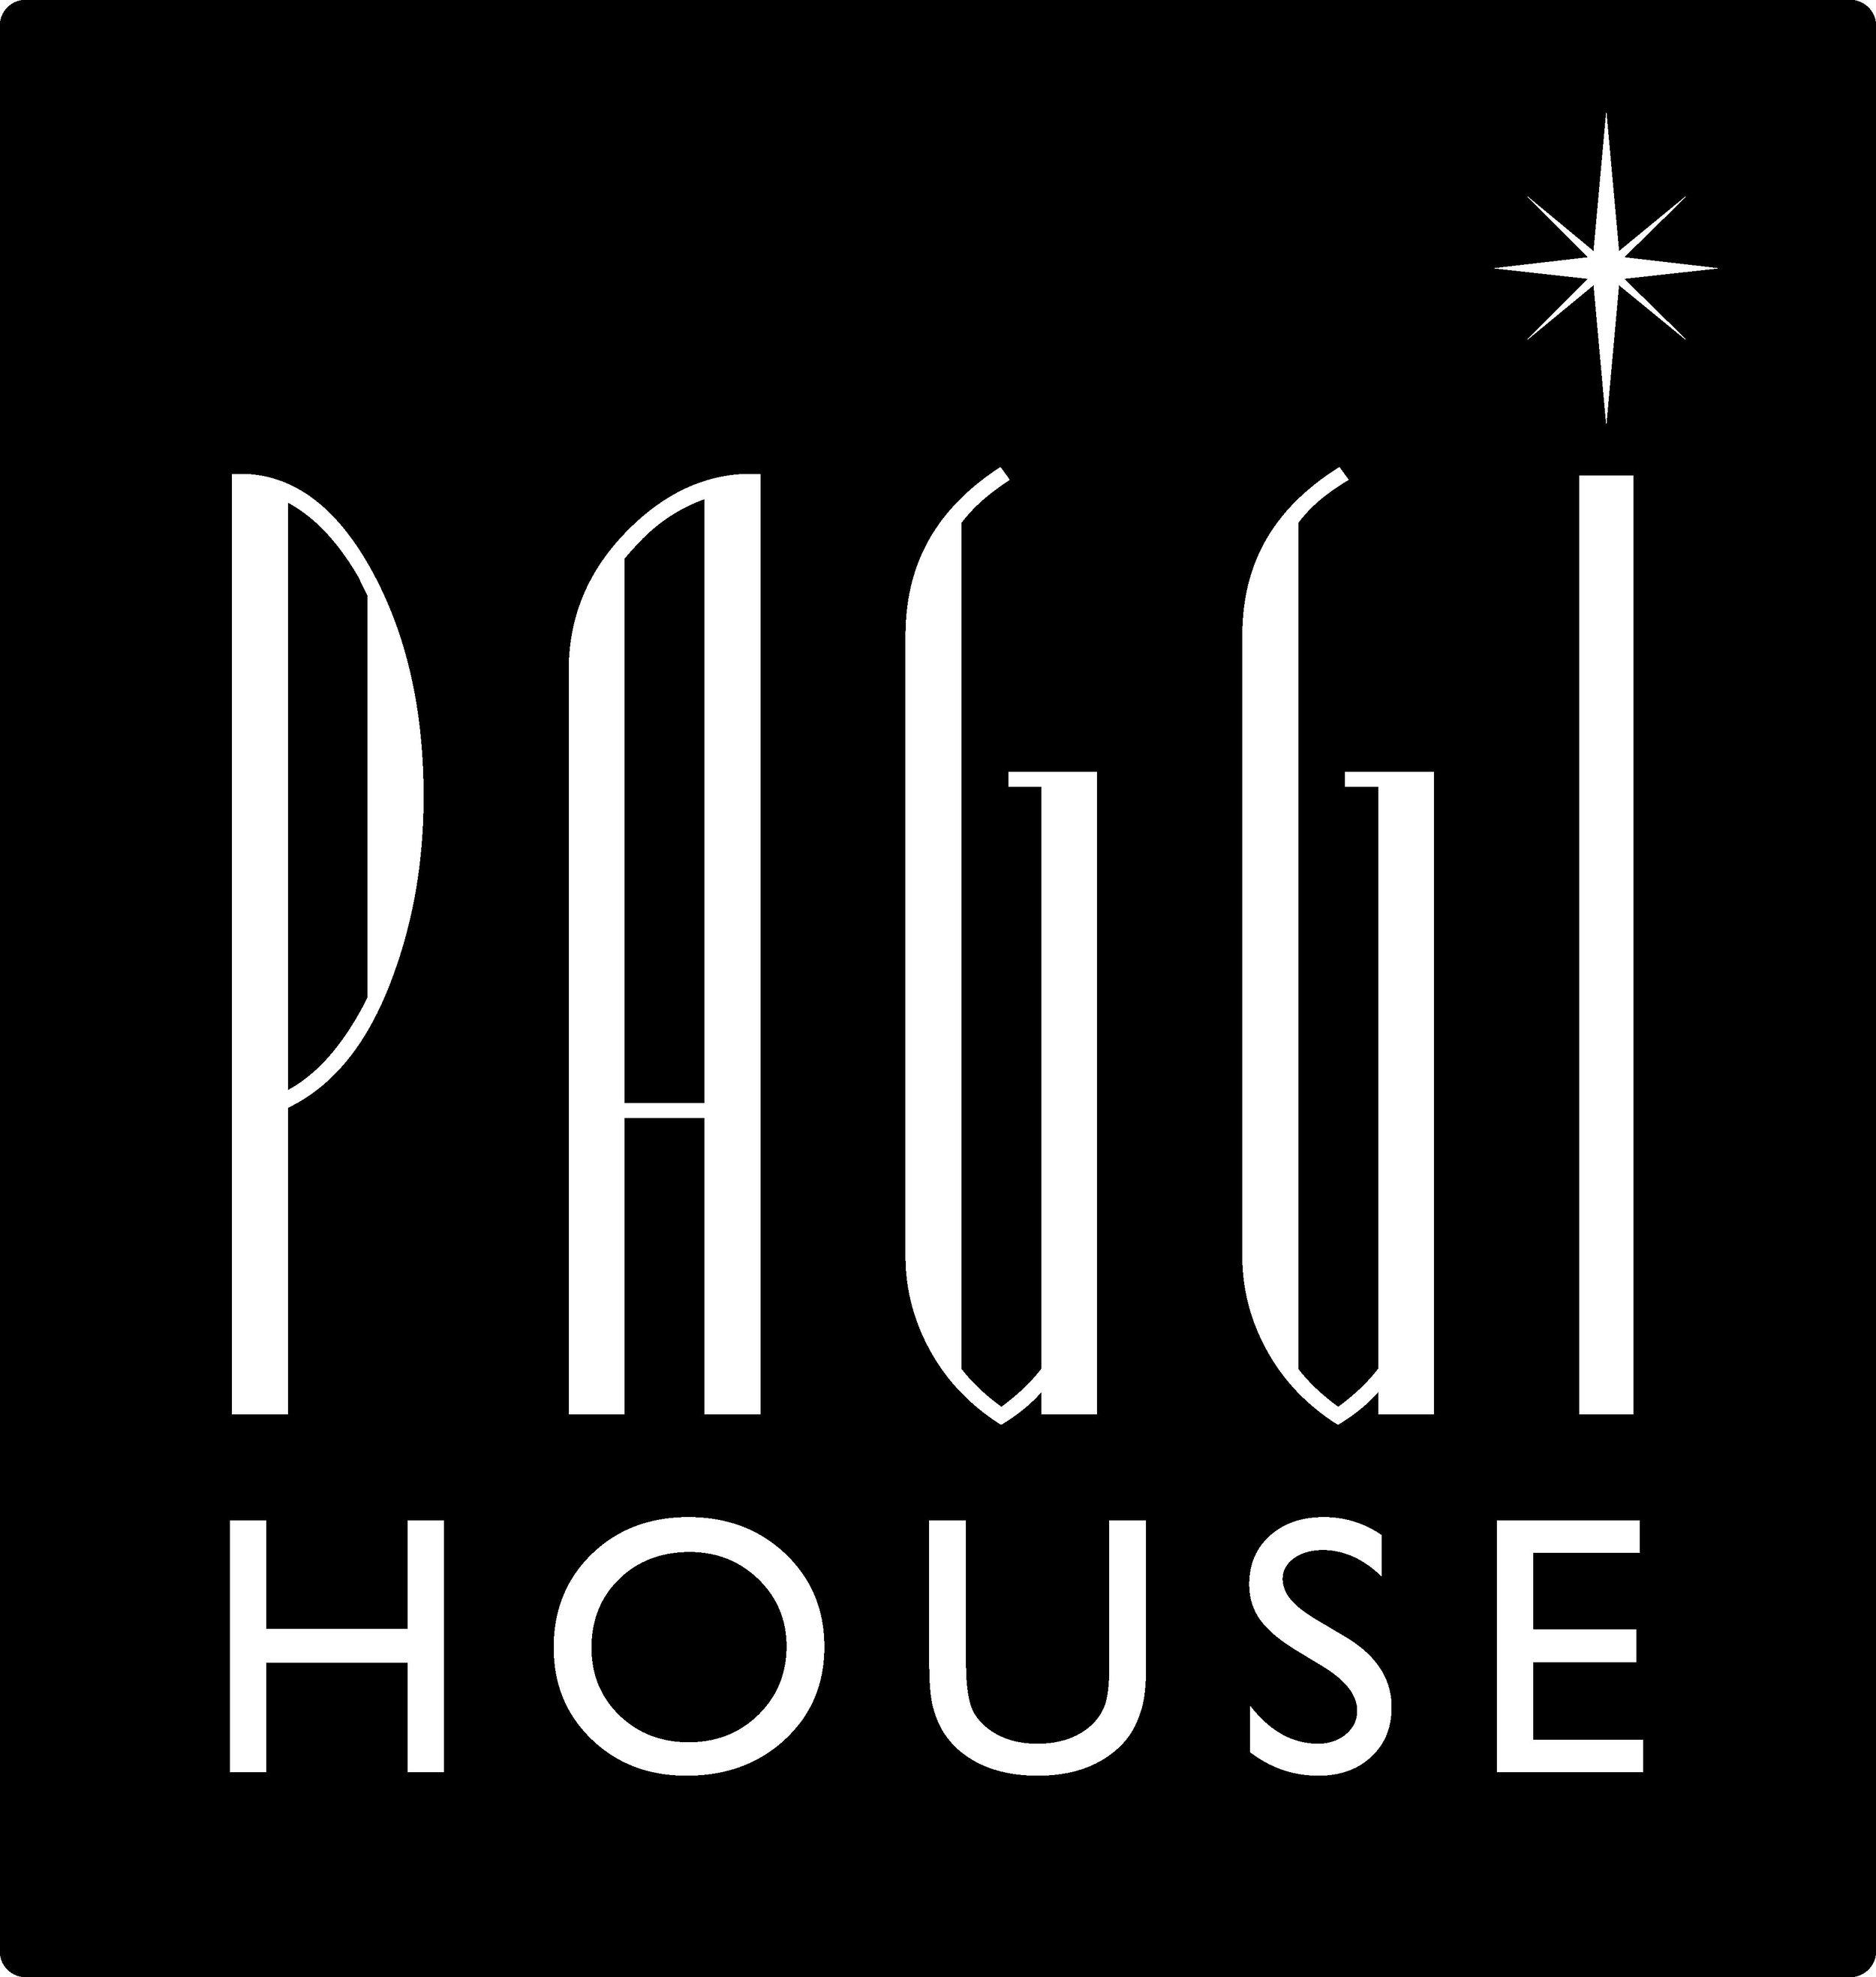 Paggi House (Sold)